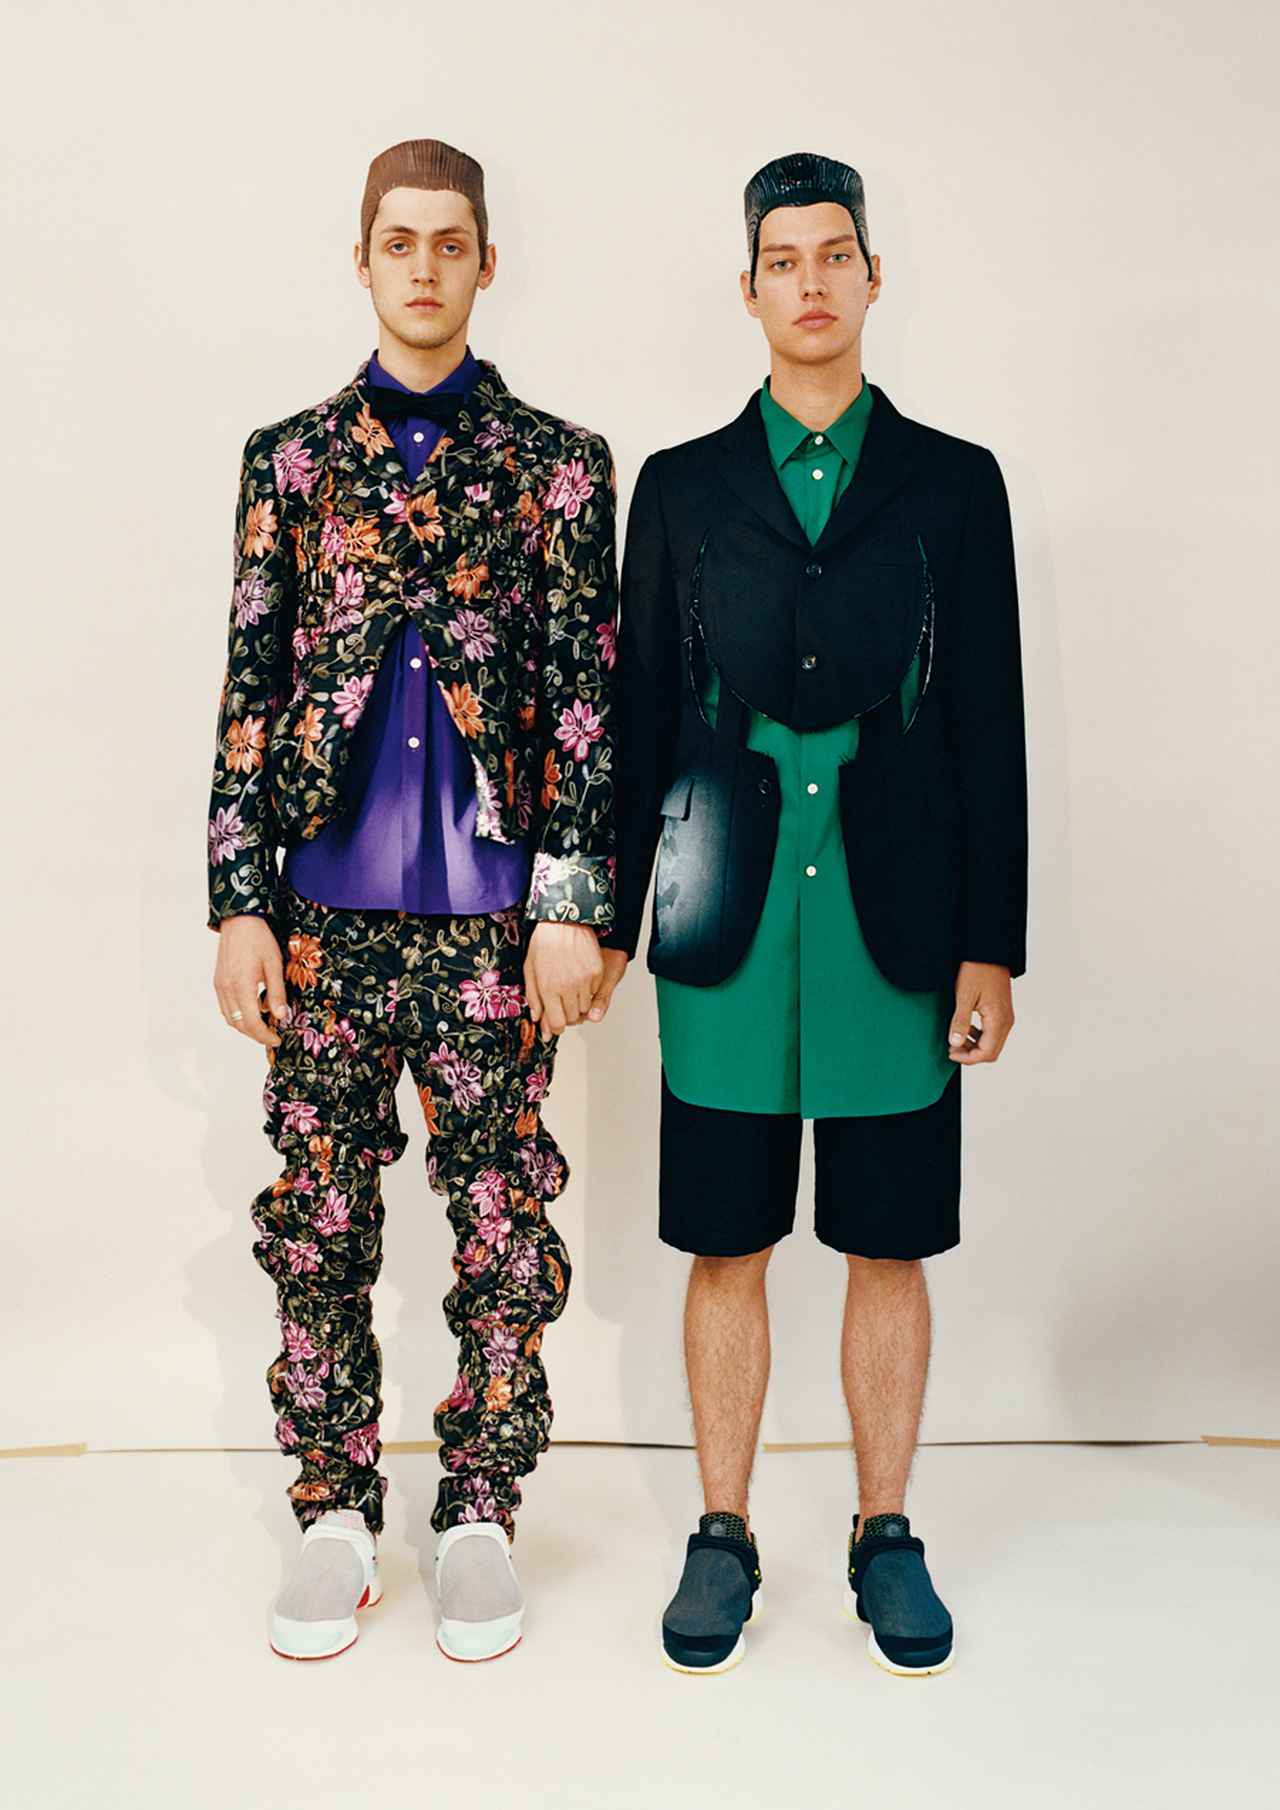 Images : 5番目の画像 - 「川久保 玲ーー ファッションの偉大なる解放者」のアルバム - T JAPAN:The New York Times Style Magazine 公式サイト